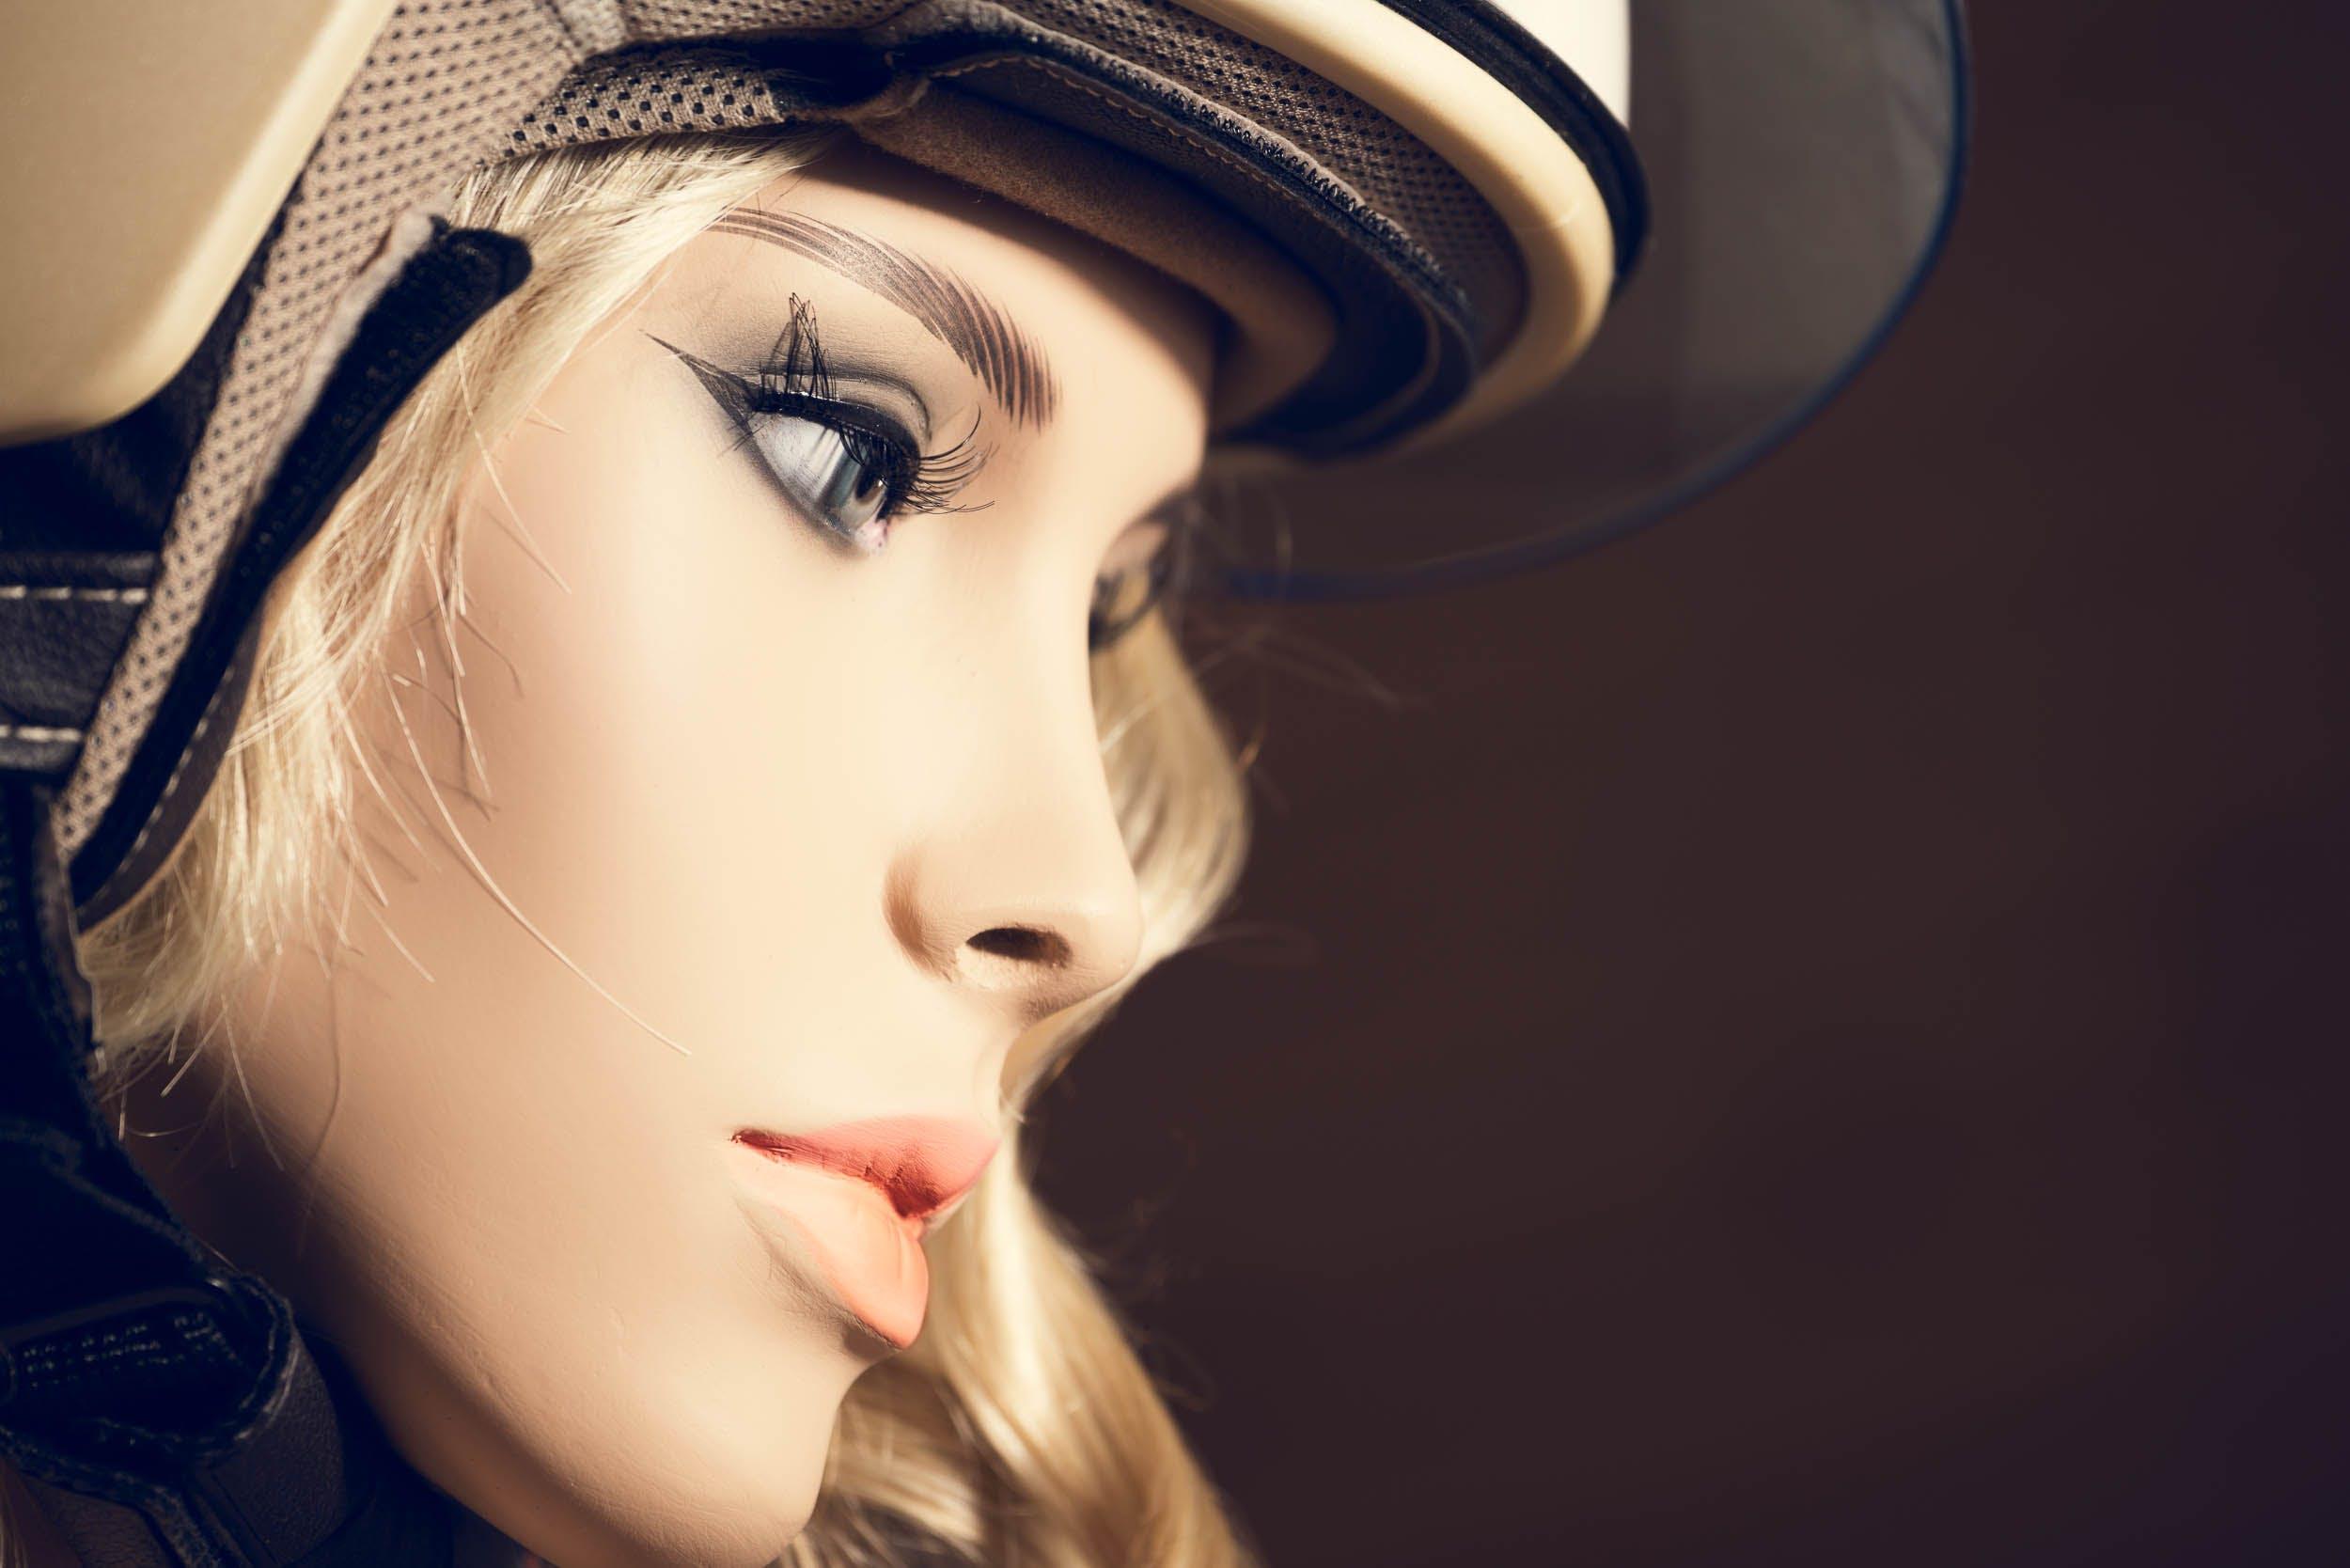 Blonde Haired Woman Wearing White Helmet